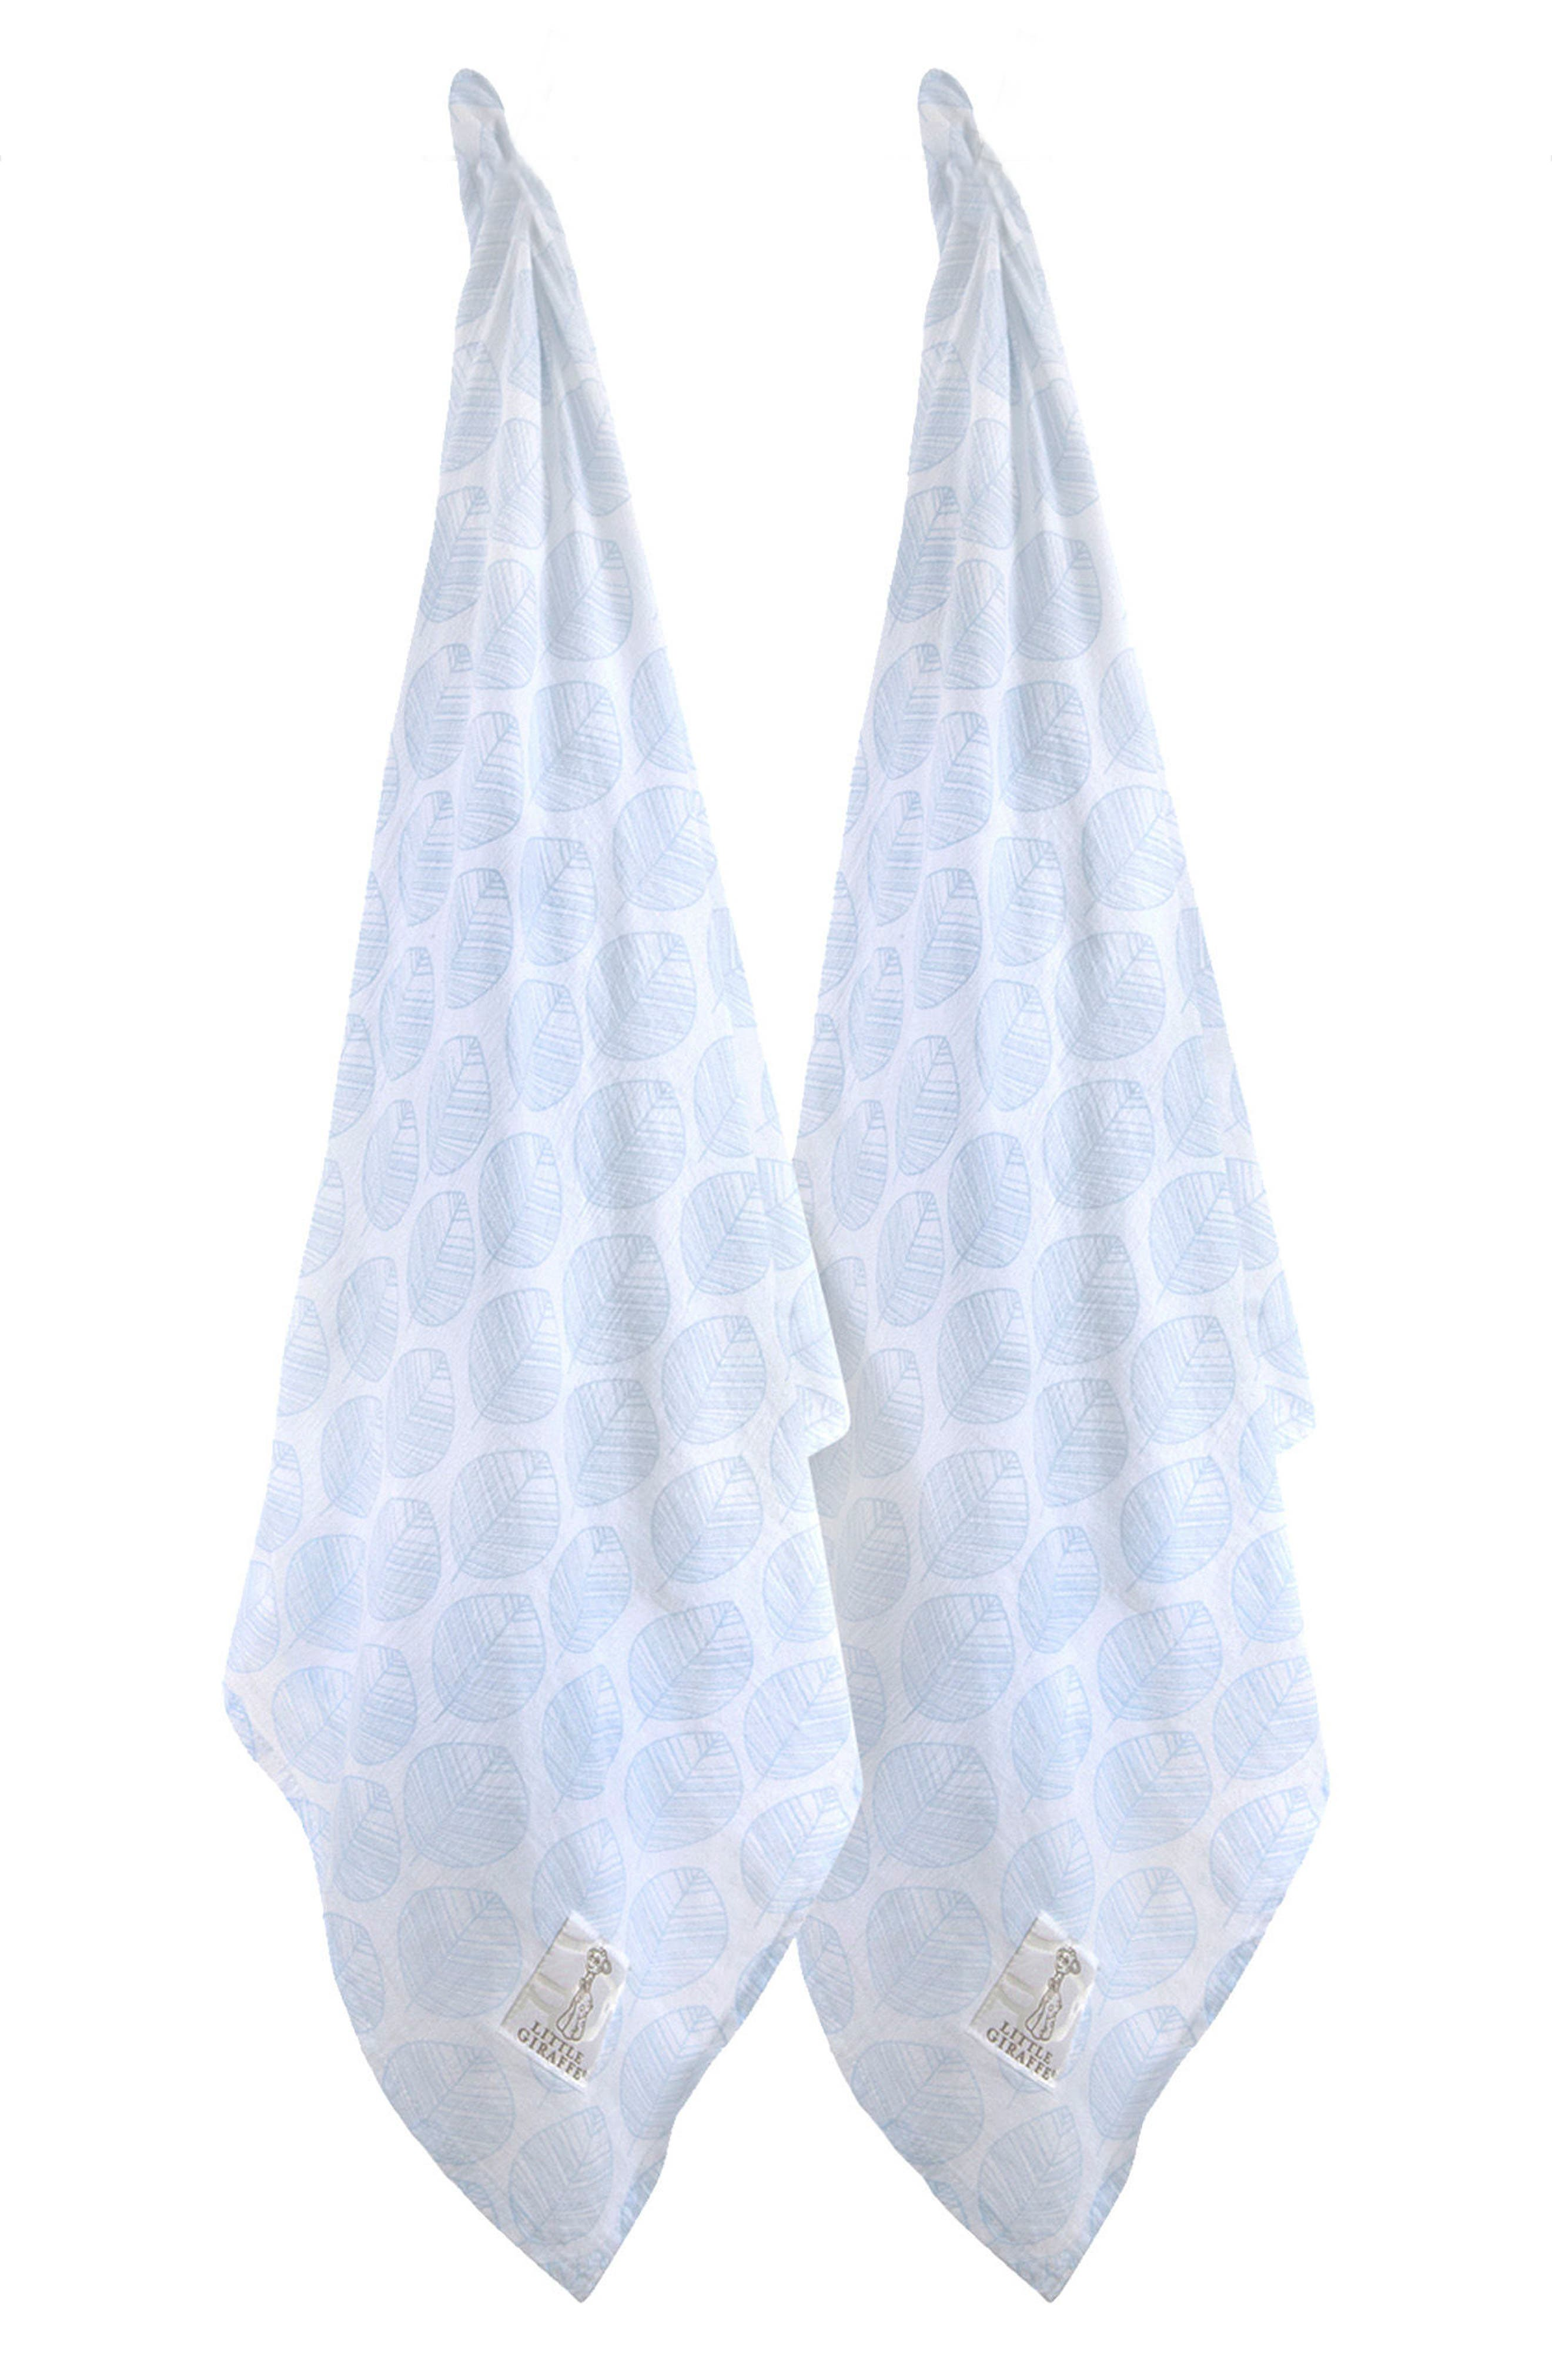 Leaf Set of 2 Swaddling Cloths,                             Main thumbnail 1, color,                             Blue